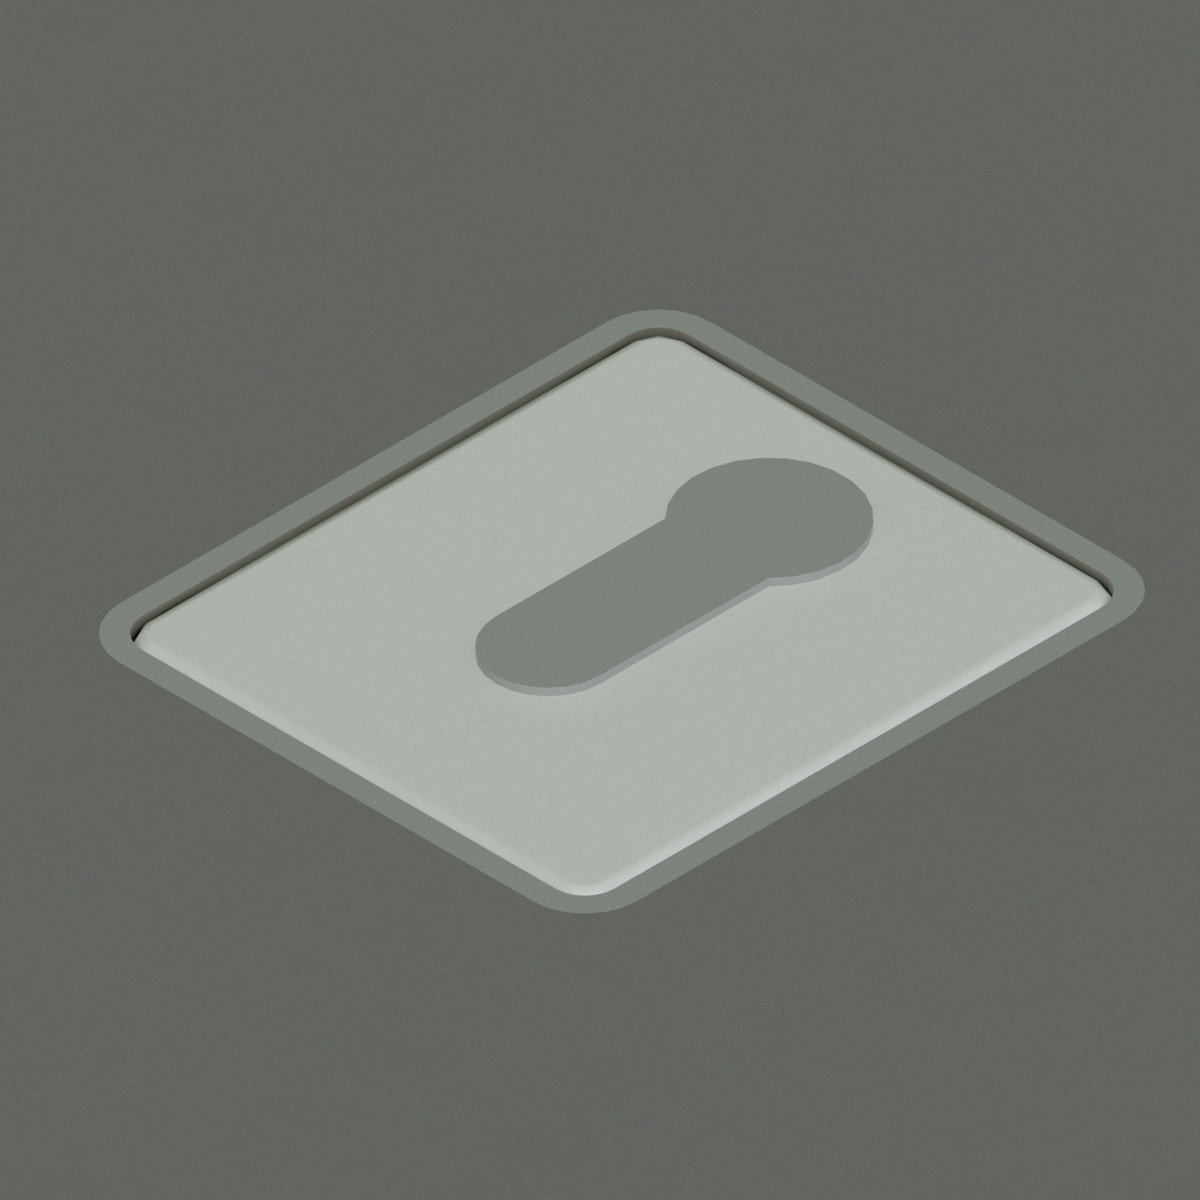 Sistema de Apertura de puerta Key Switch_Flush en BIM